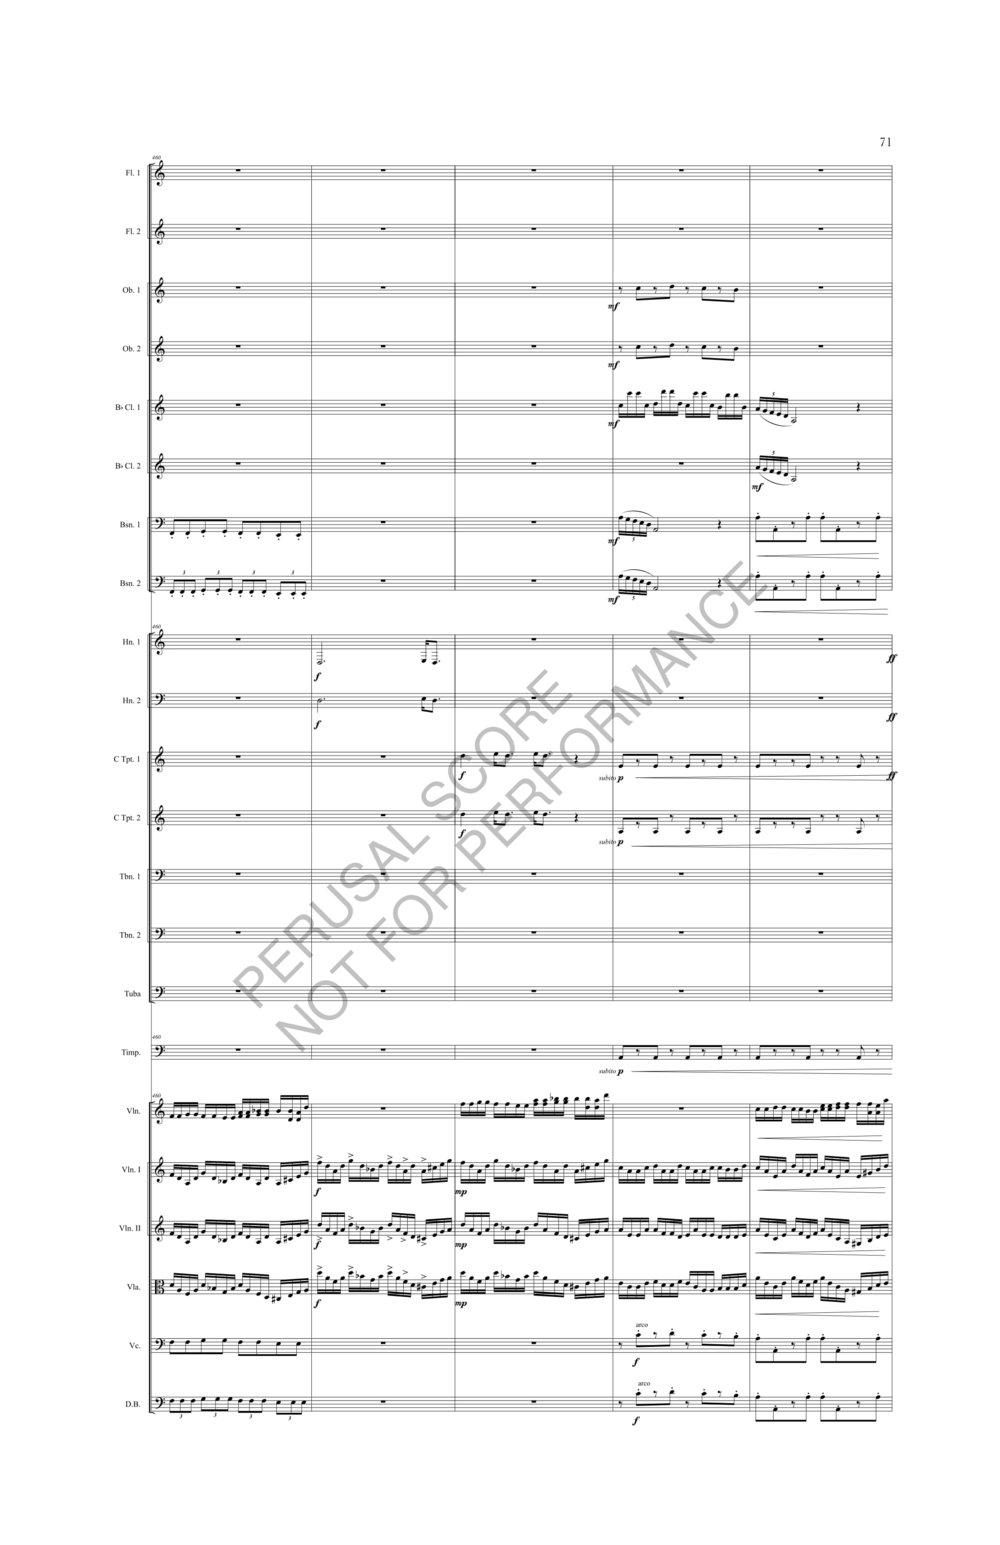 Boyd Sybil Score-watermark (1)-077.jpg